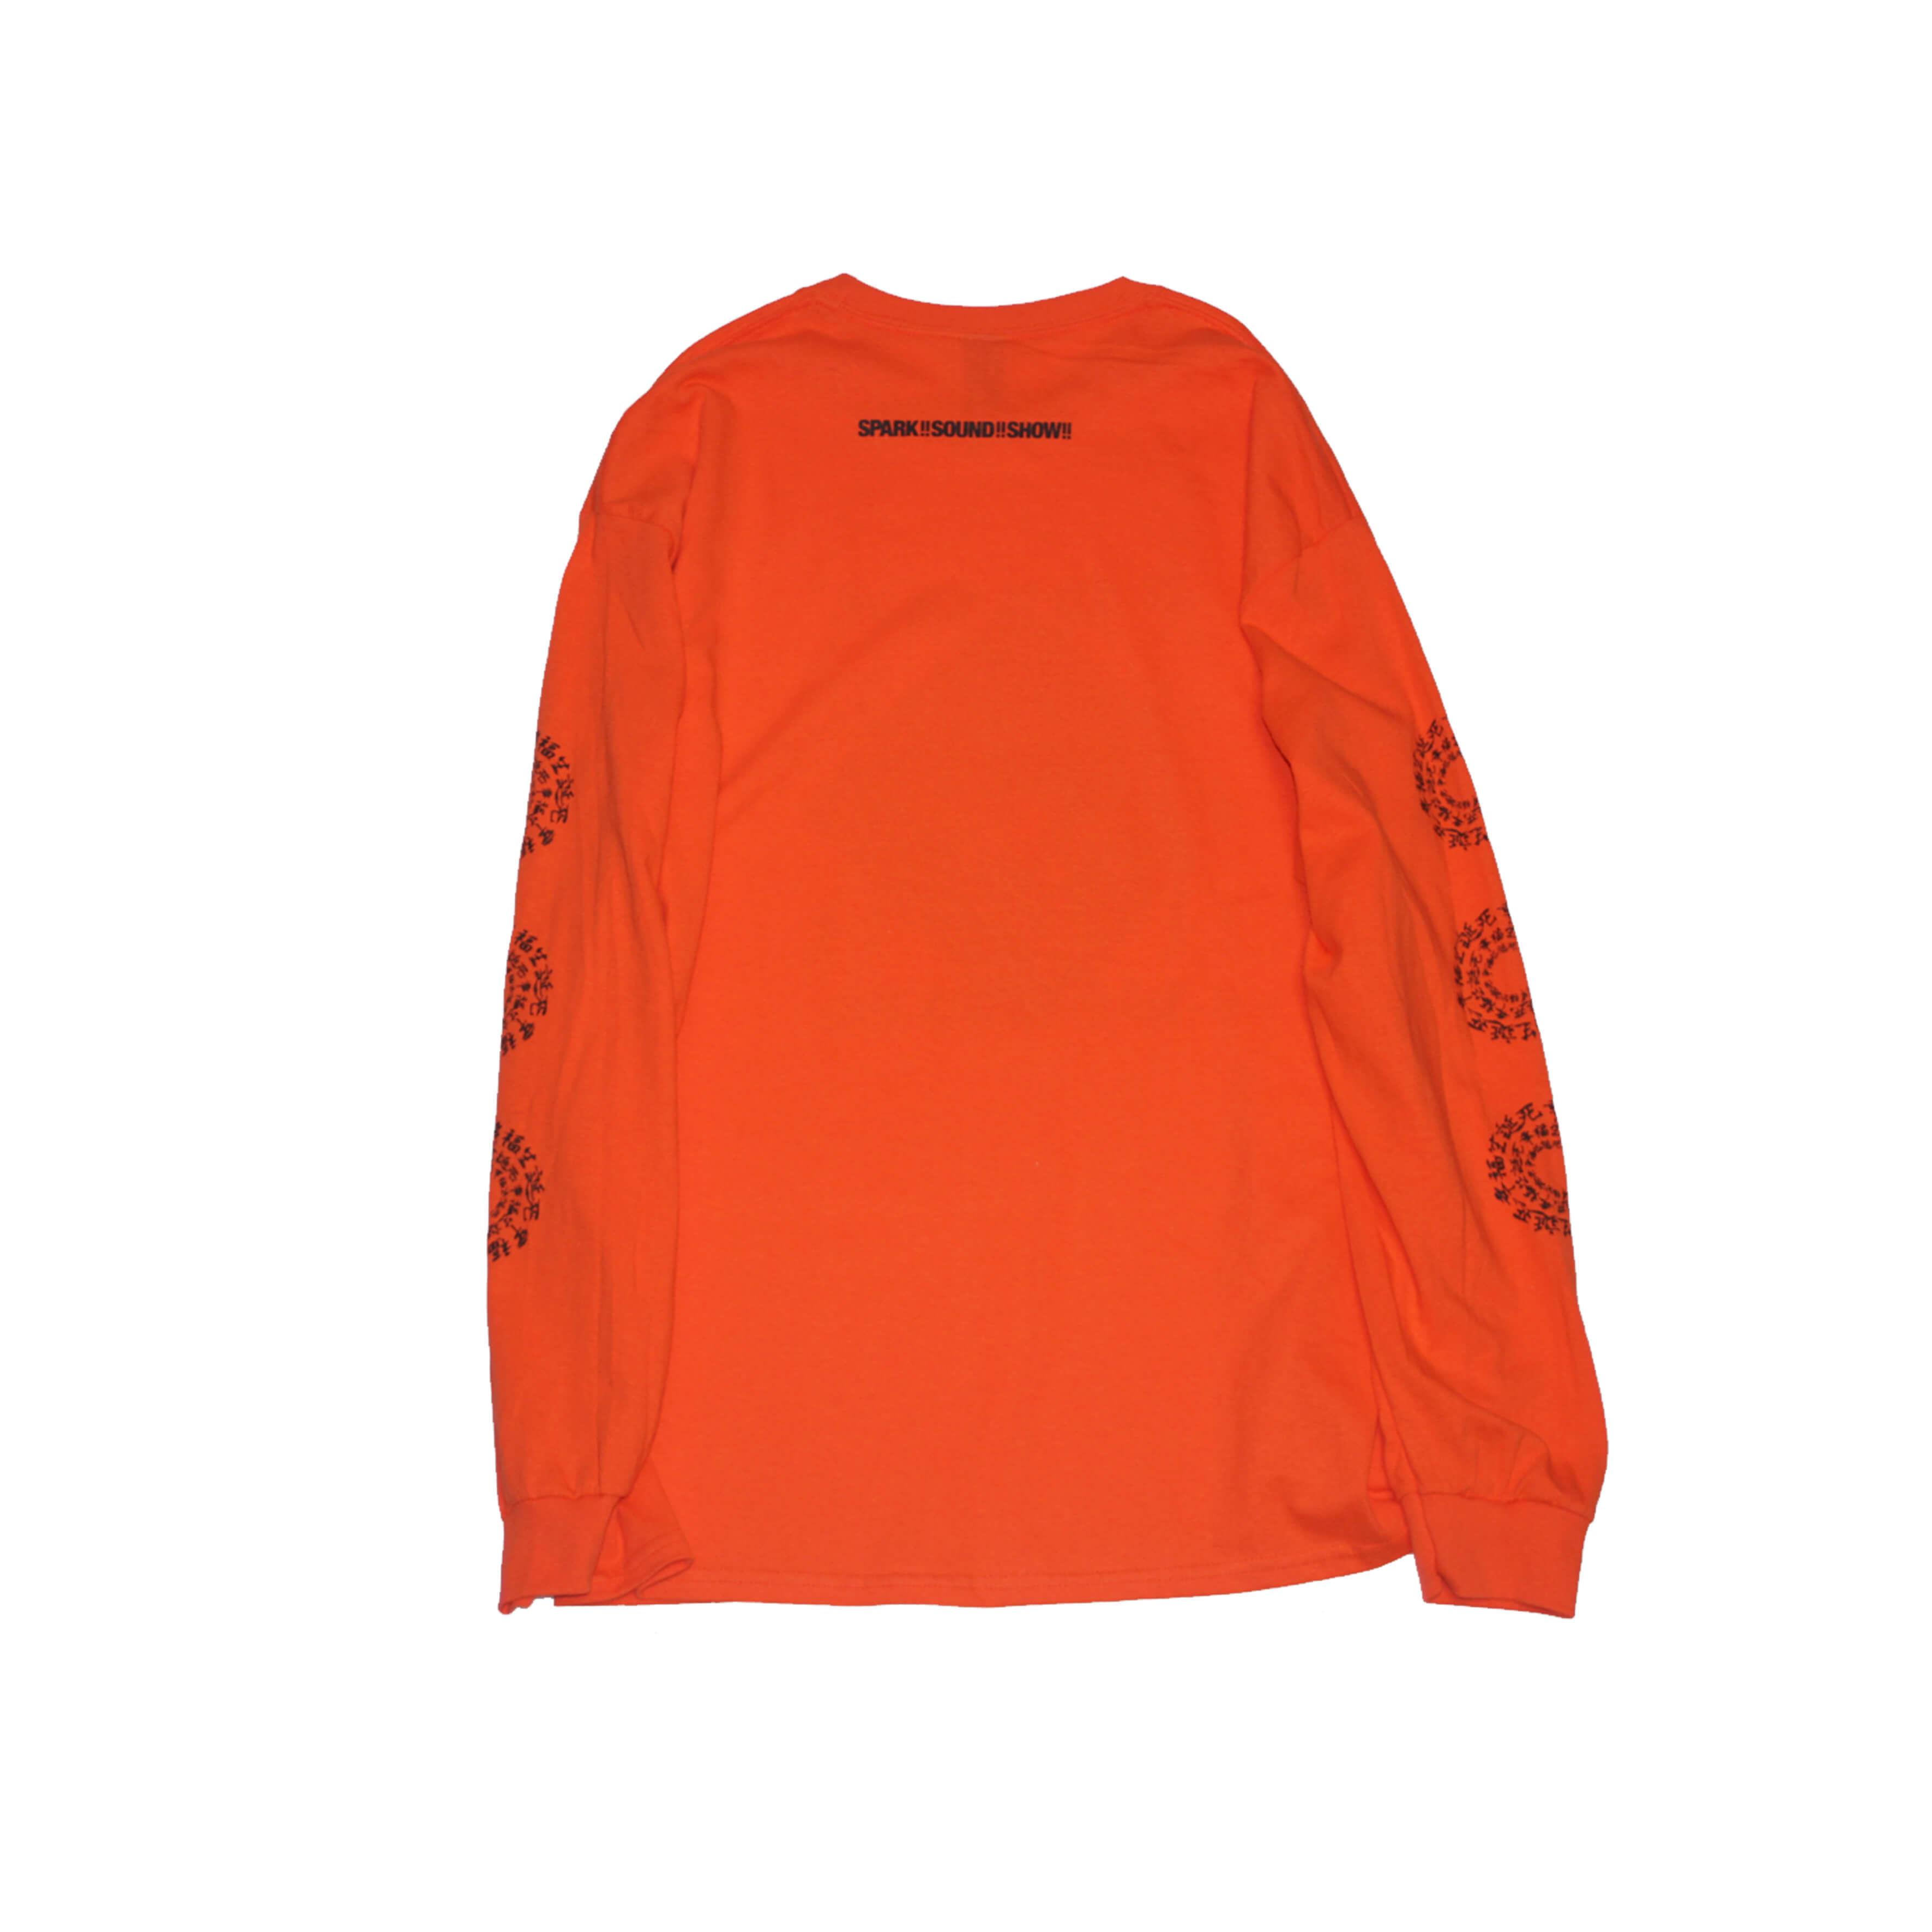 幸福生誕死 Long Sleeve T-Shirt (ORANGE)